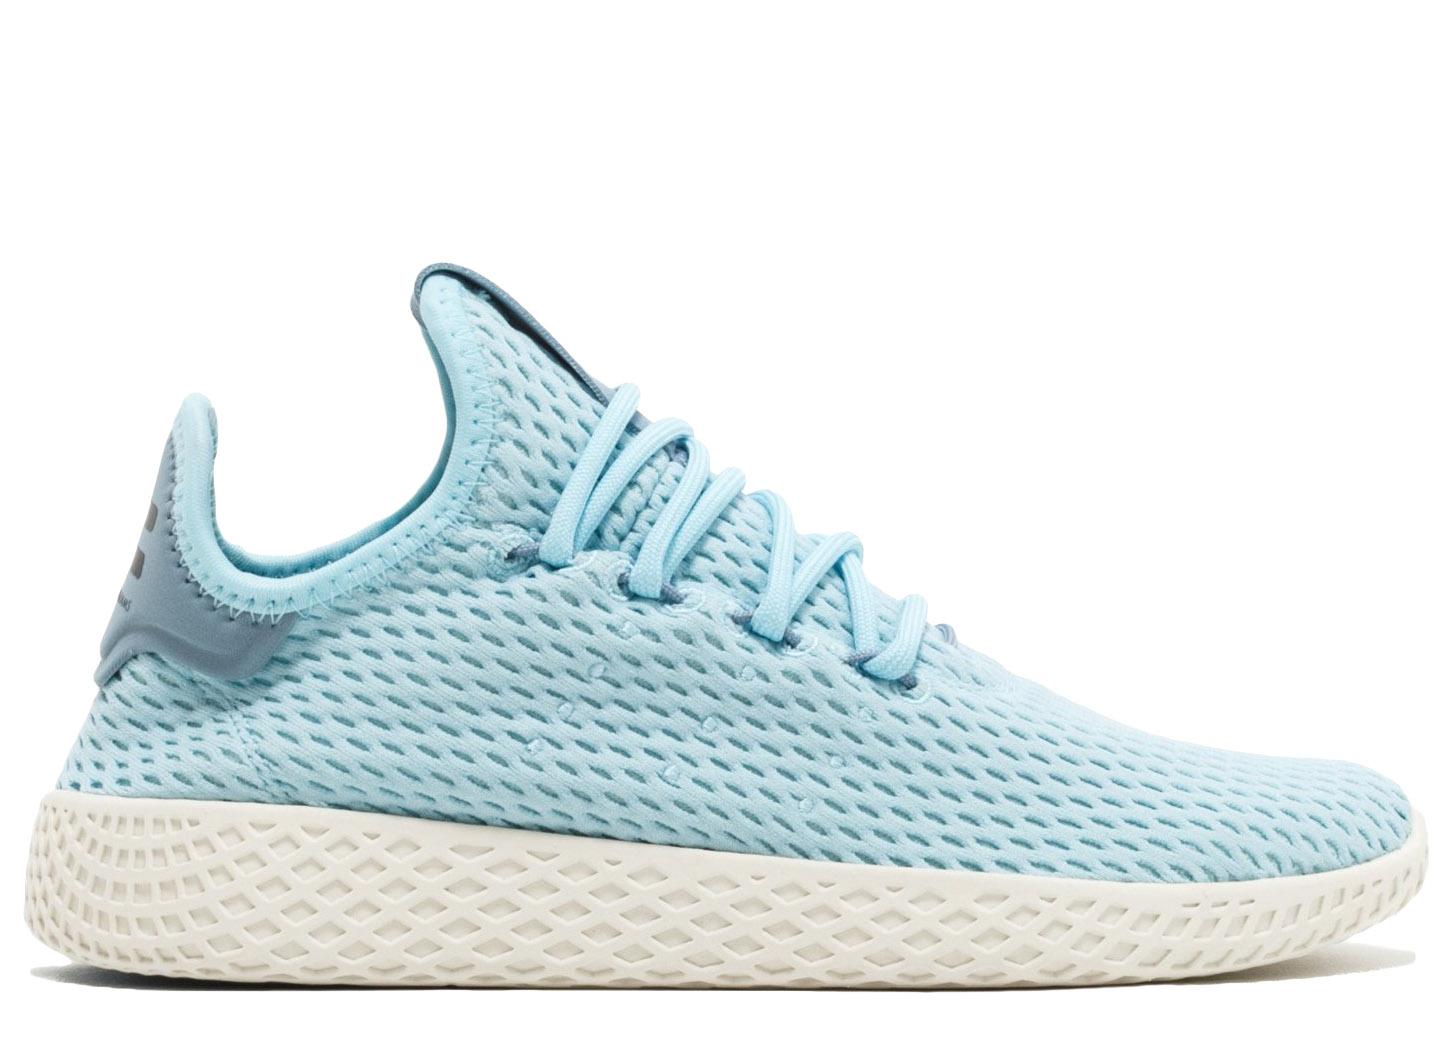 adidas Tennis Hu x Pharrell Williams Ice Blue (Youth)